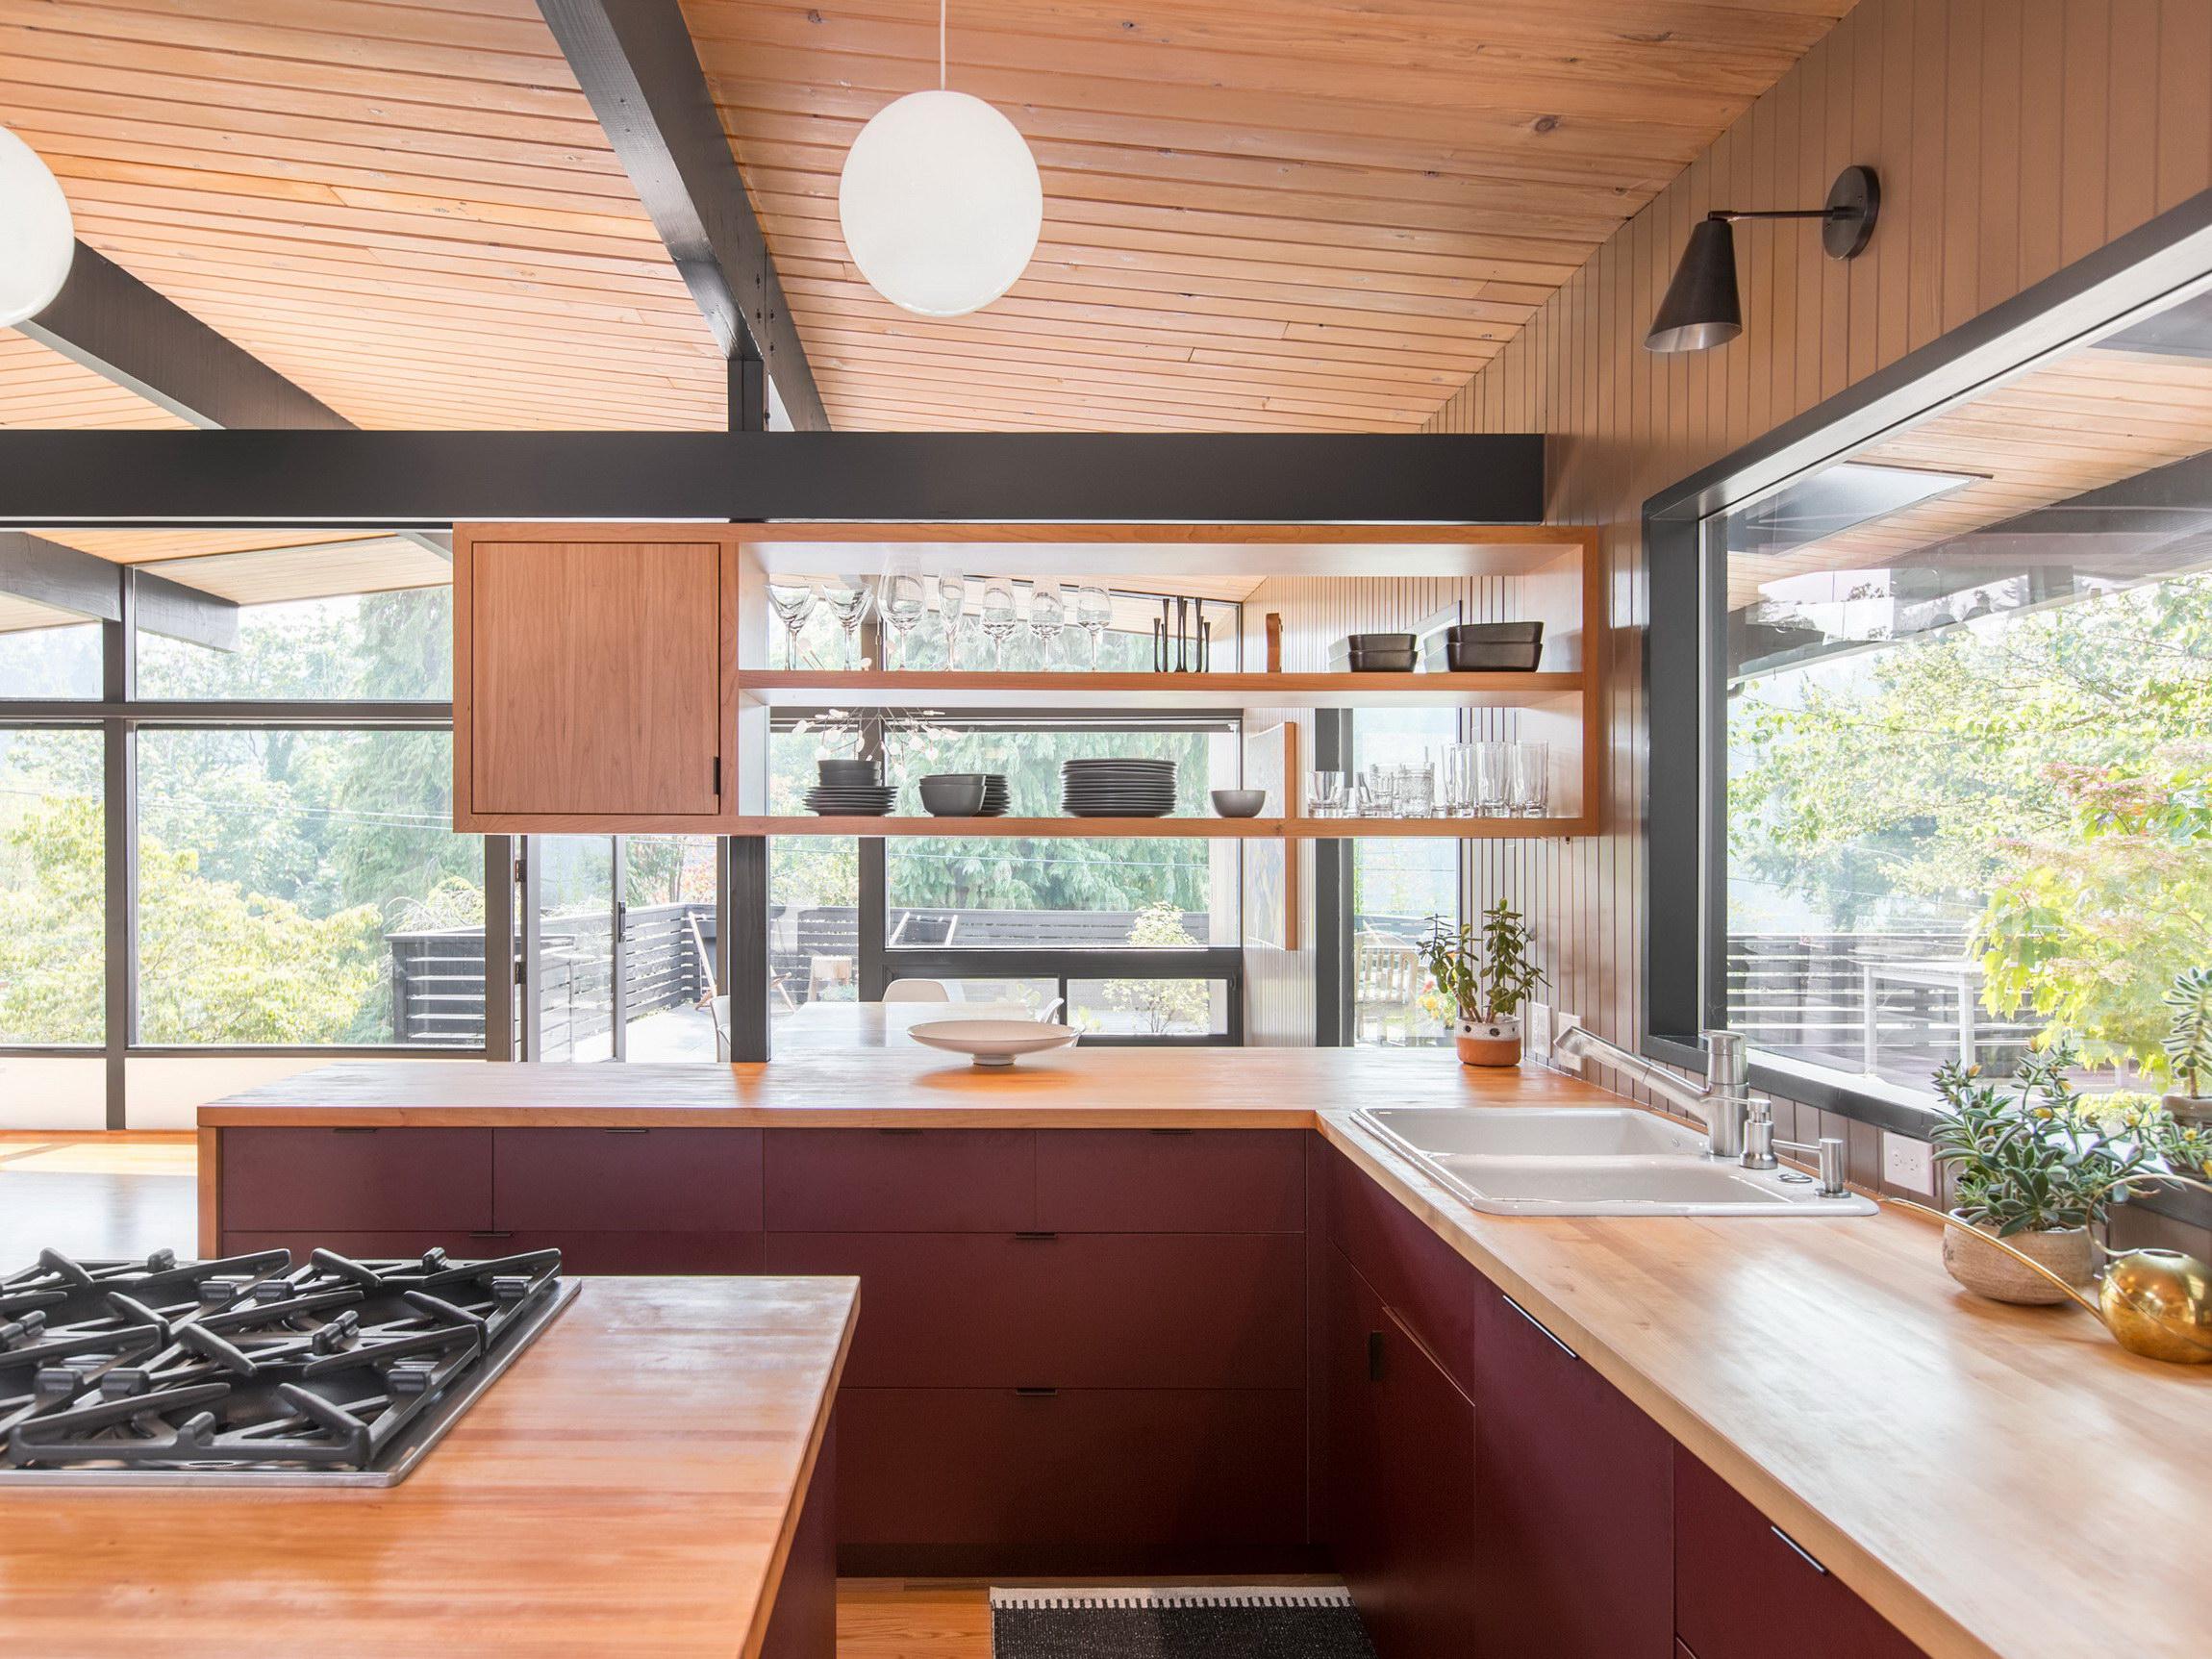 Hillside Midcentury Mid Century Modern Home Renovation